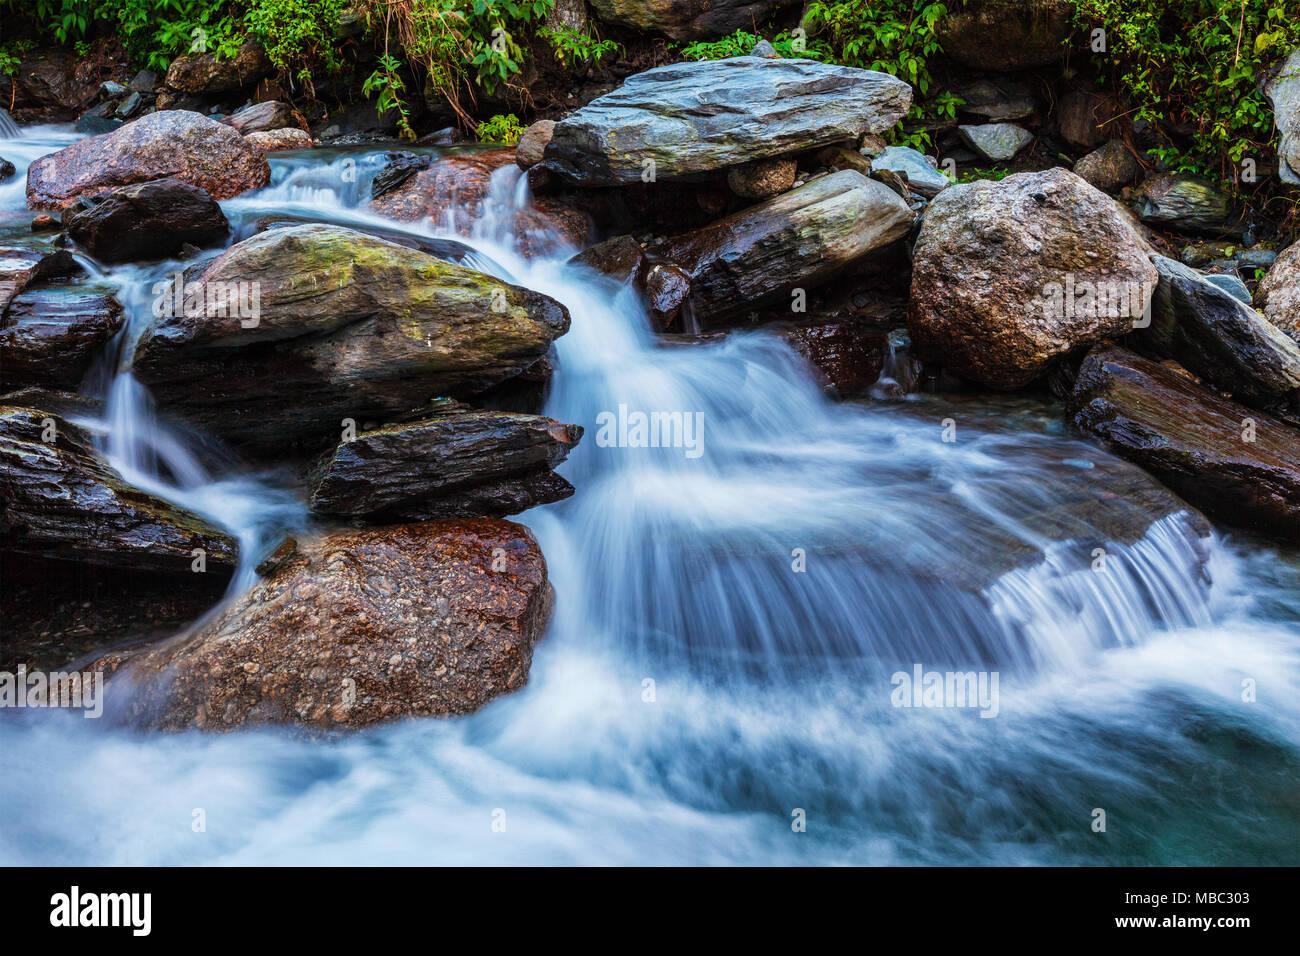 Bhagsu waterfall. Bhagsu, Himachal Pradesh, India - Stock Image